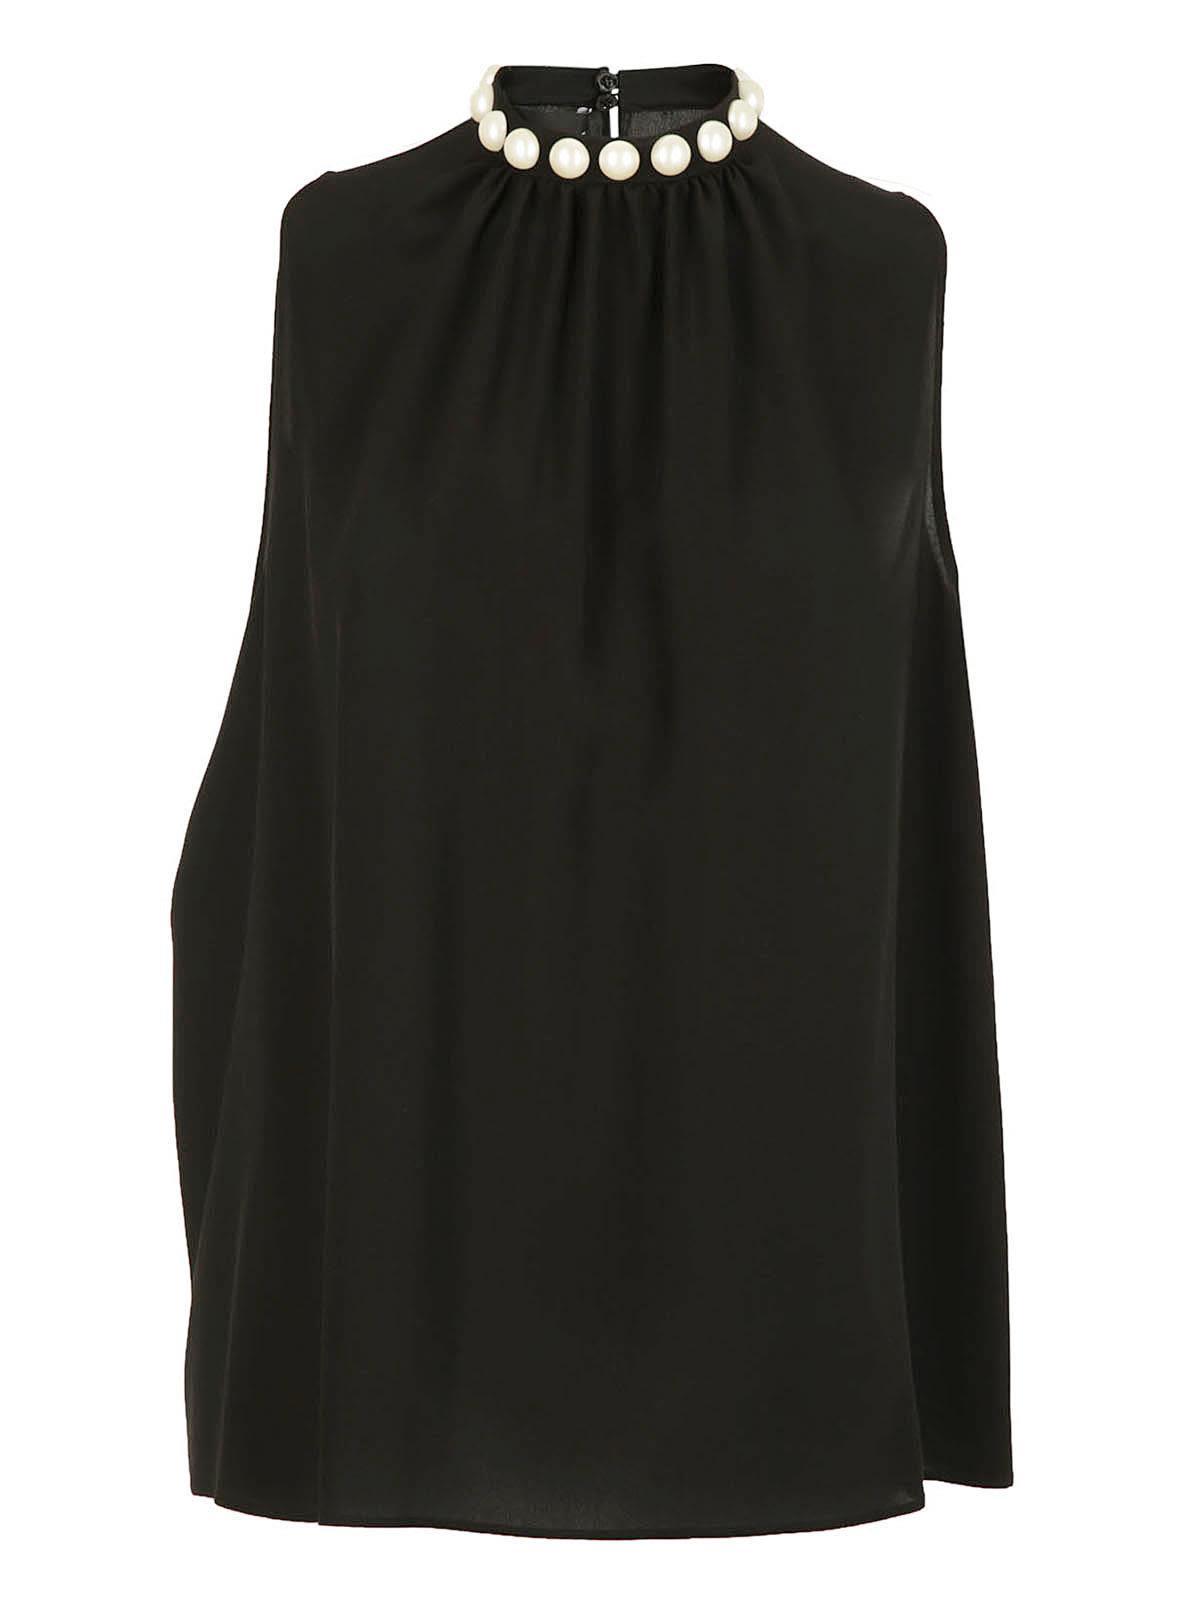 Boutique Moschino negro top con tachonado en halter cuello ZRAZqdgwr